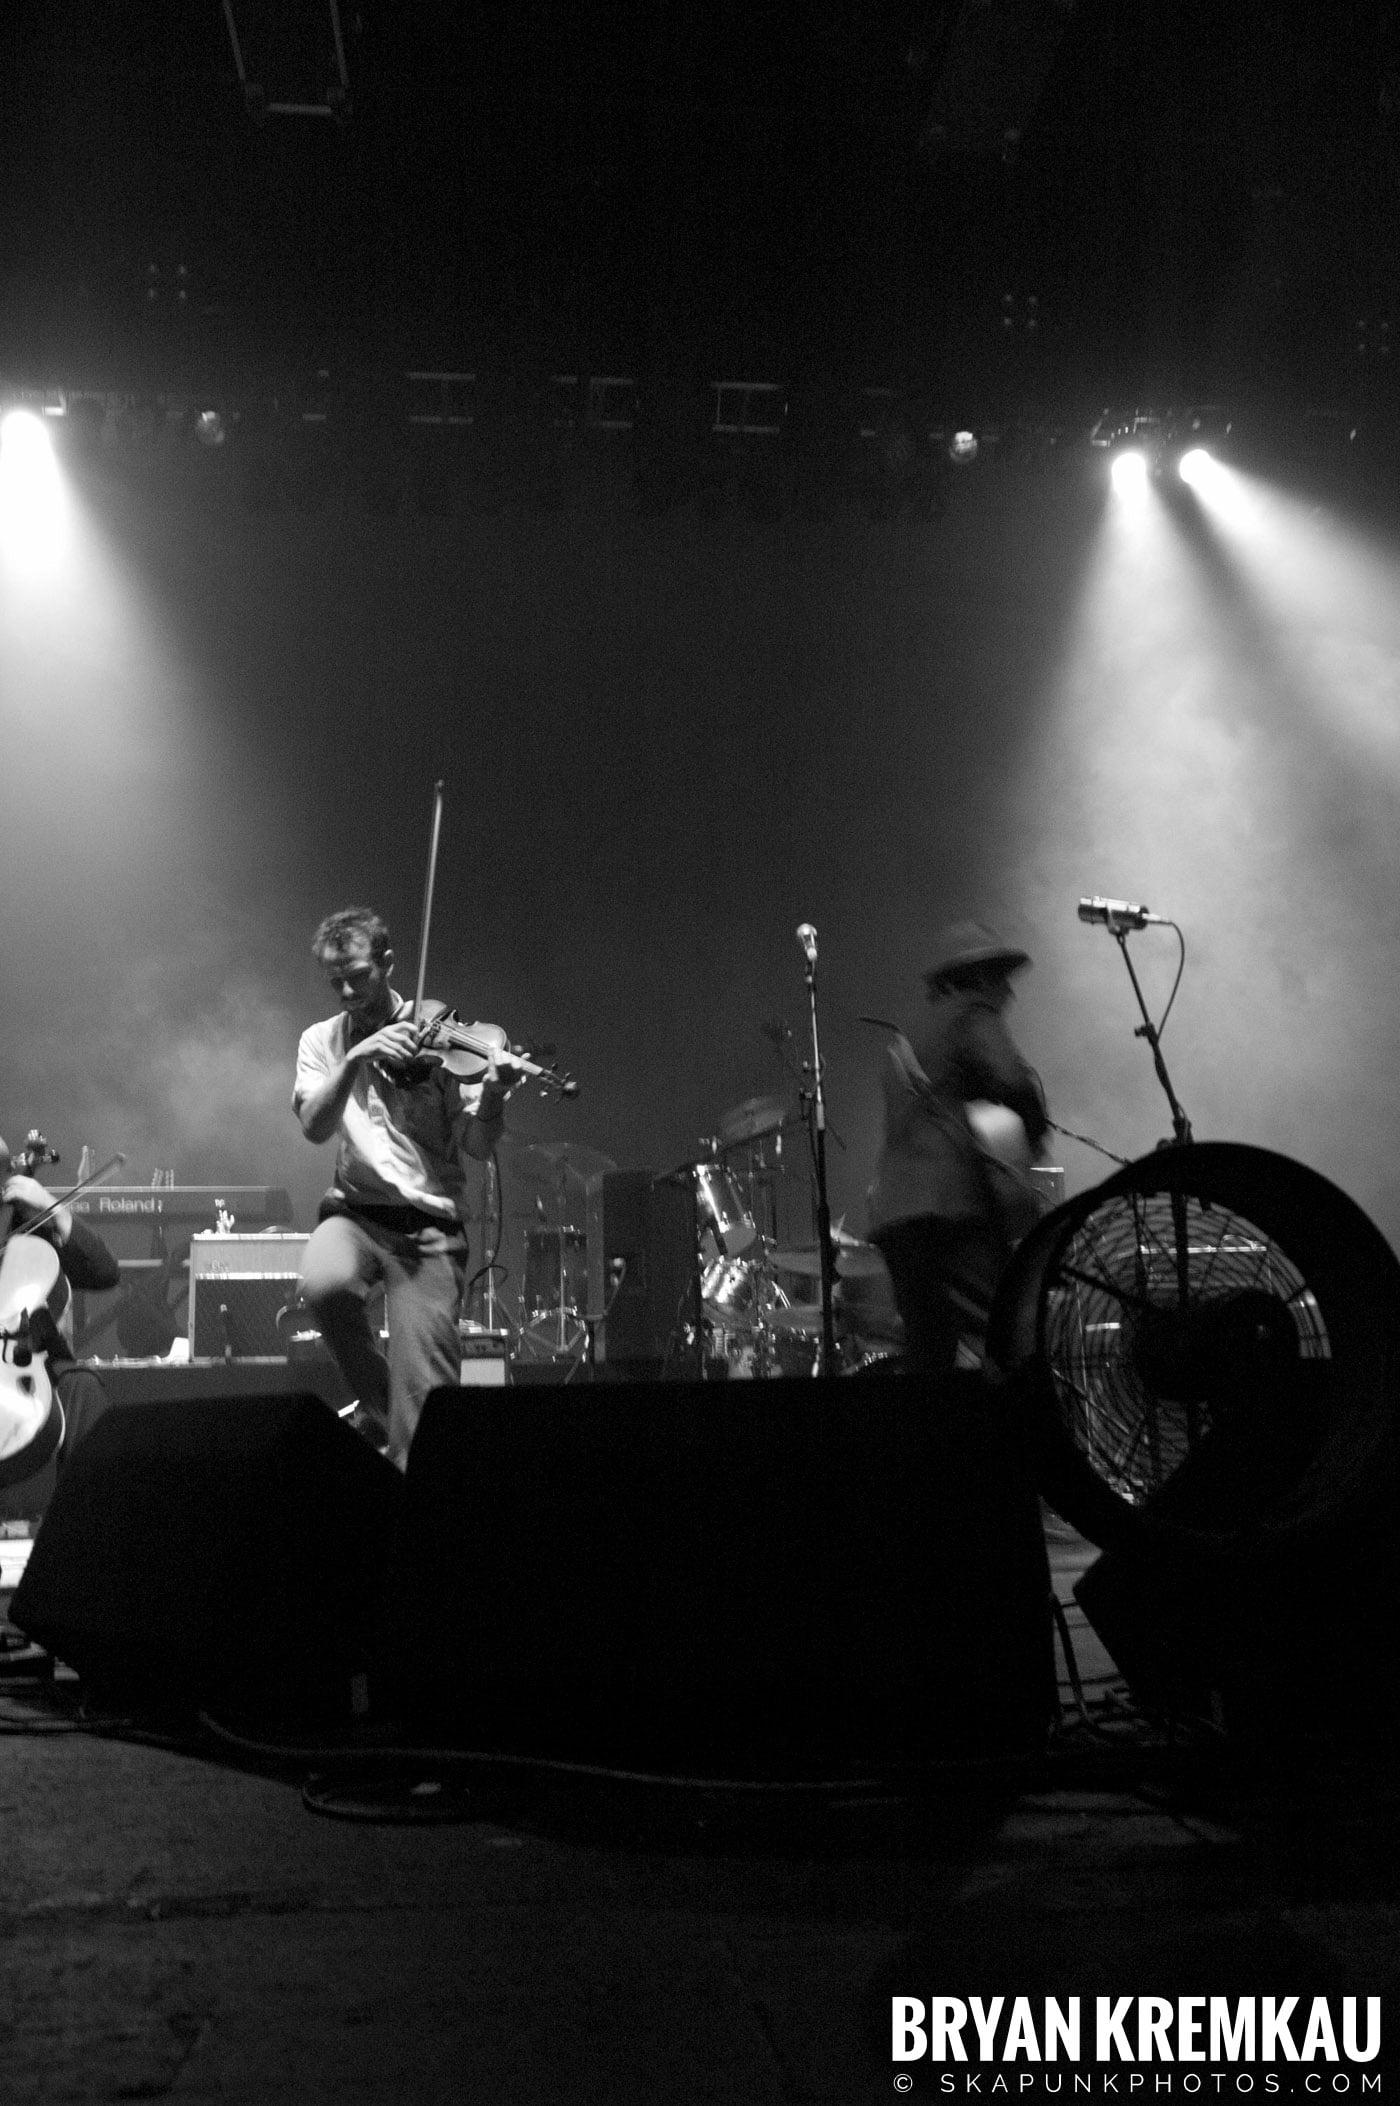 Larrikin Love @ Brixton Academy, London UK - 12.17.06 (5)